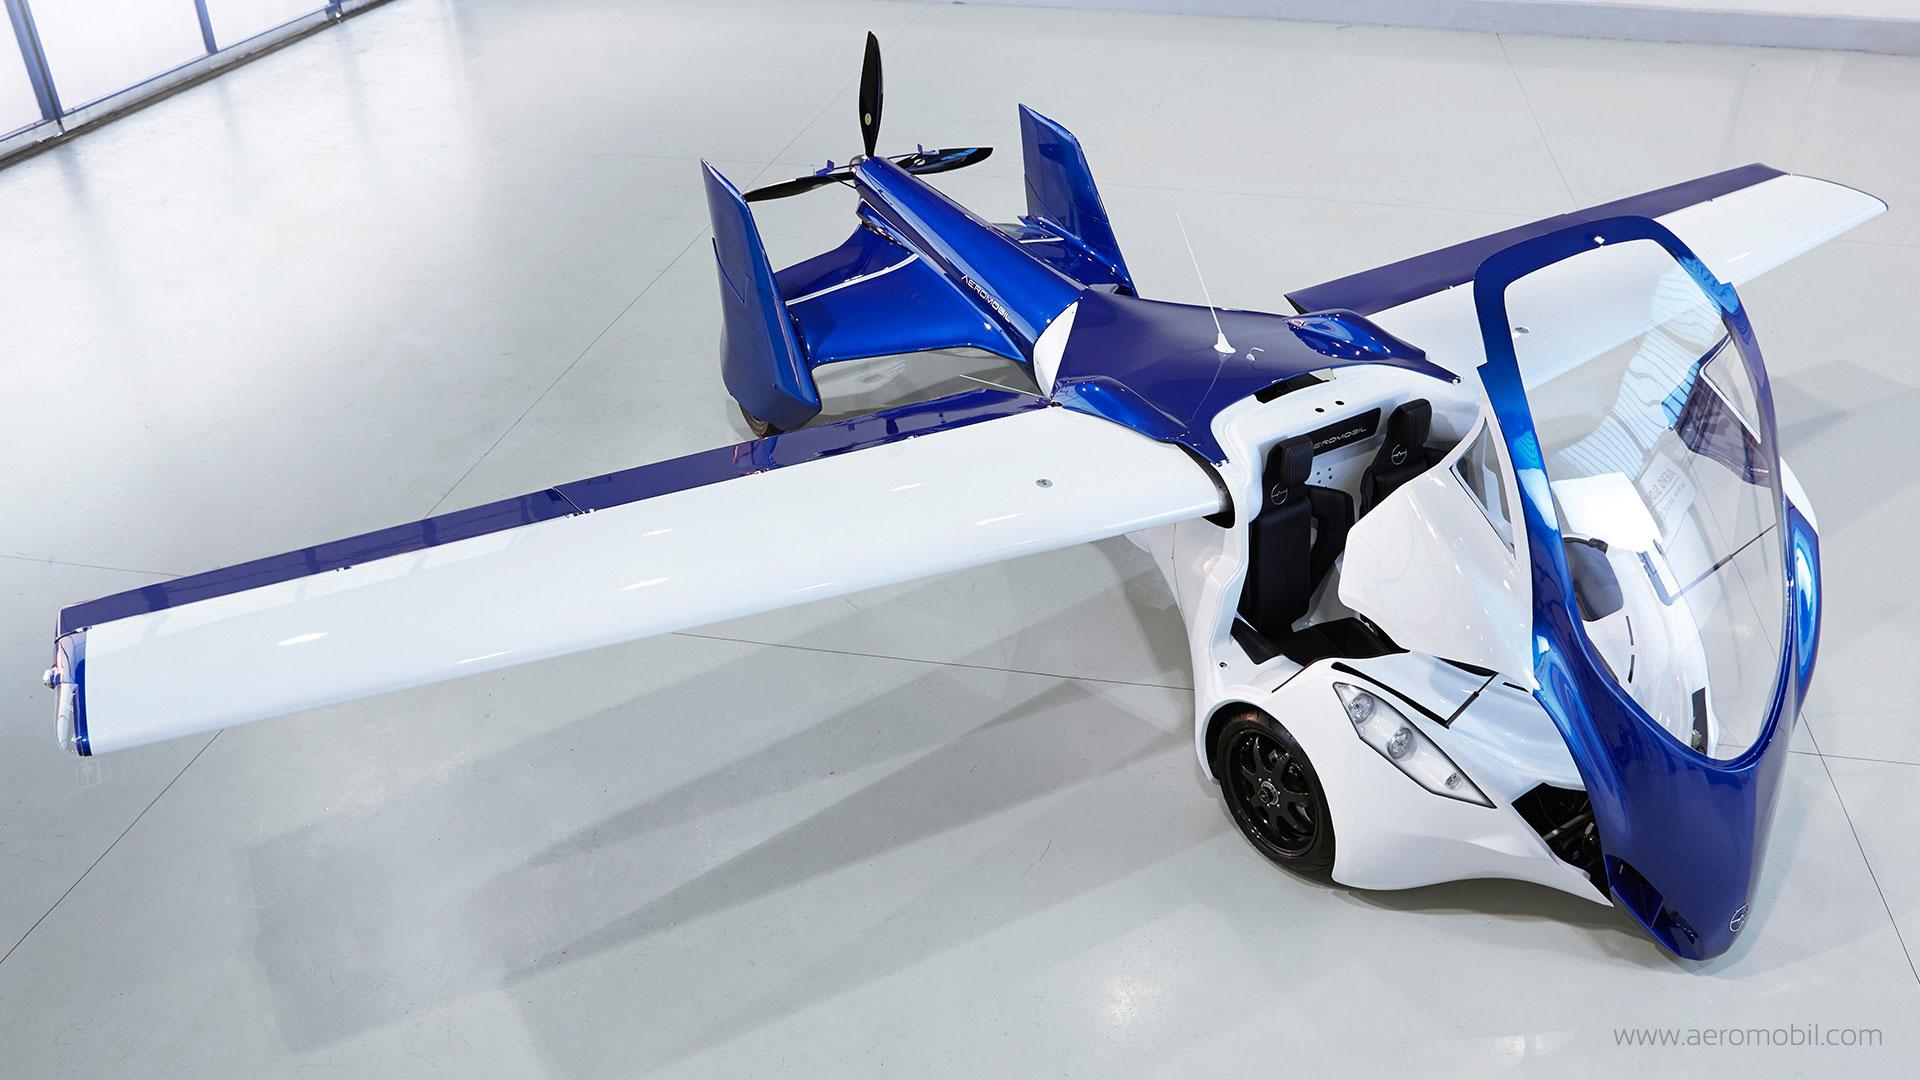 AeroMobil 3.0.